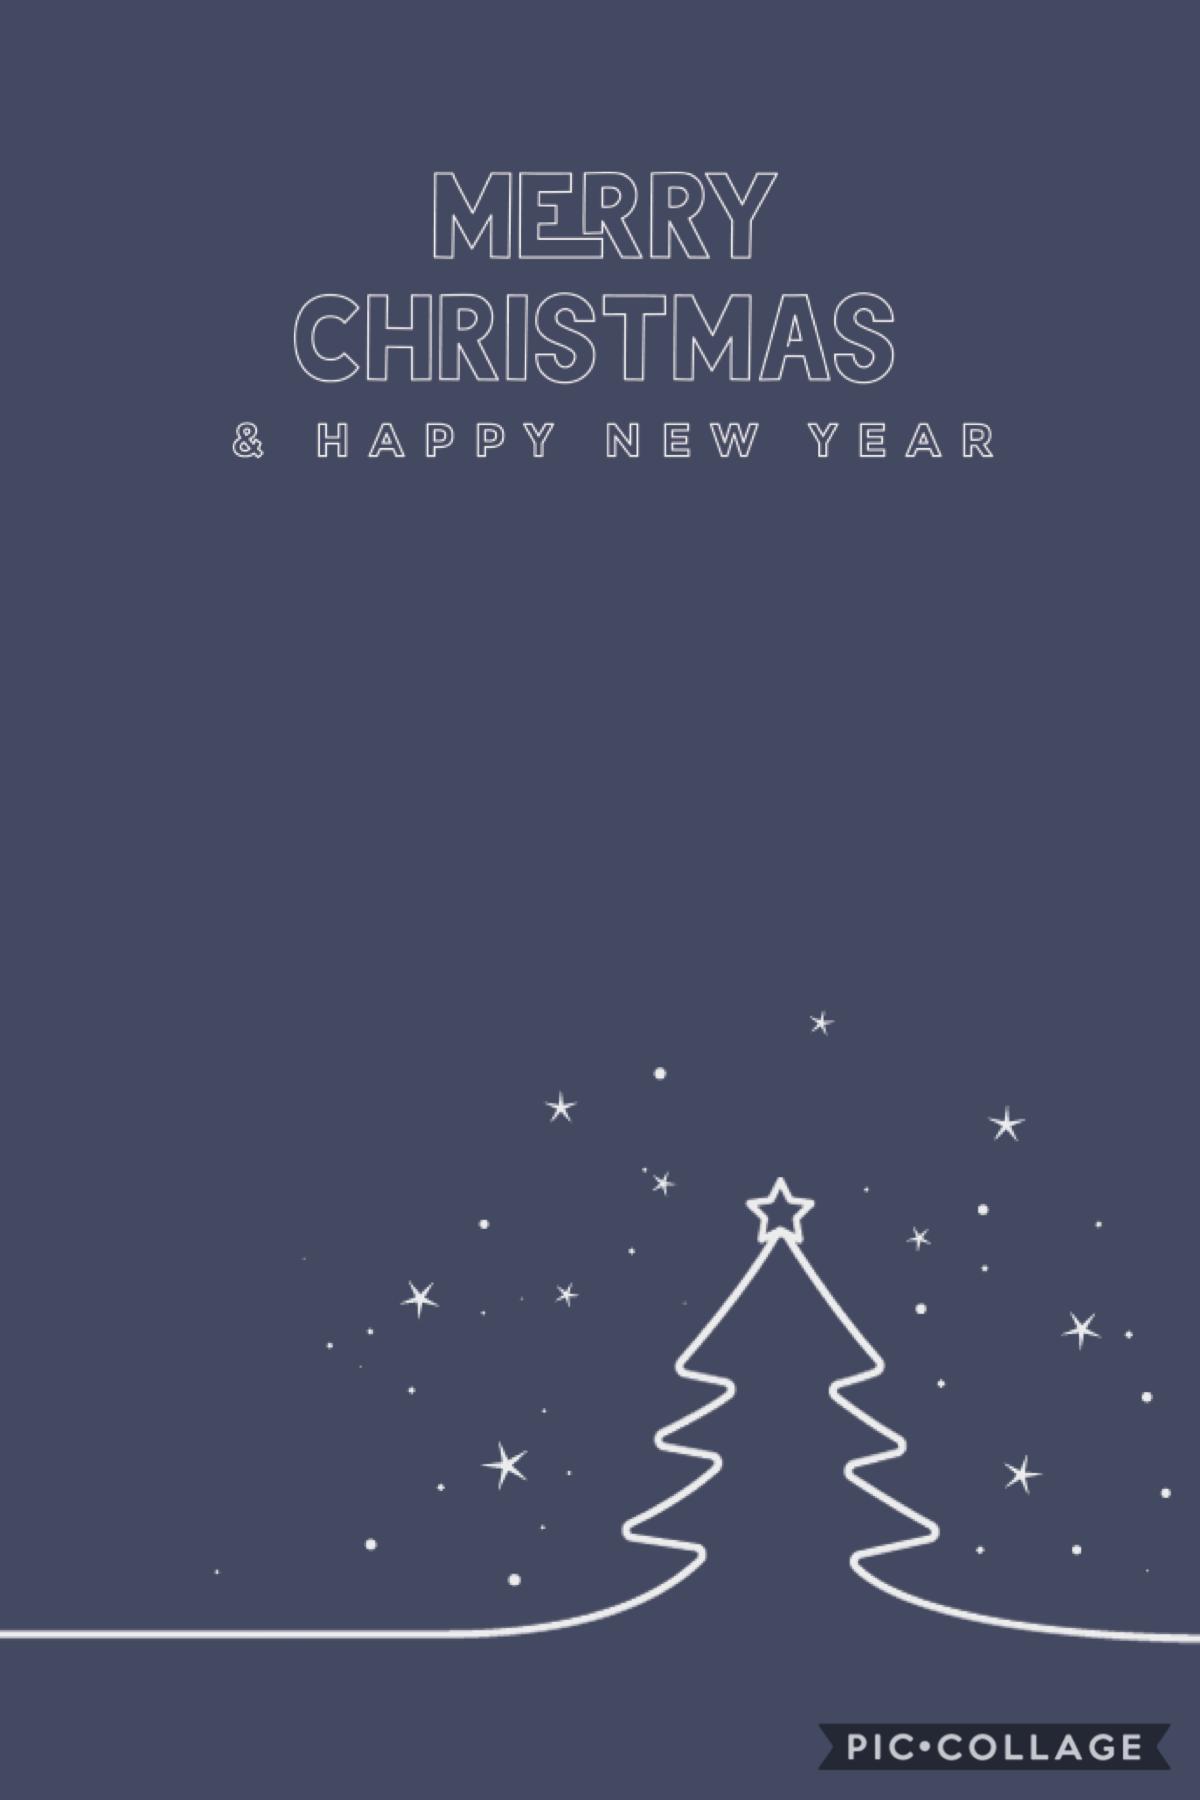 3 days till christmas!🎄🎁